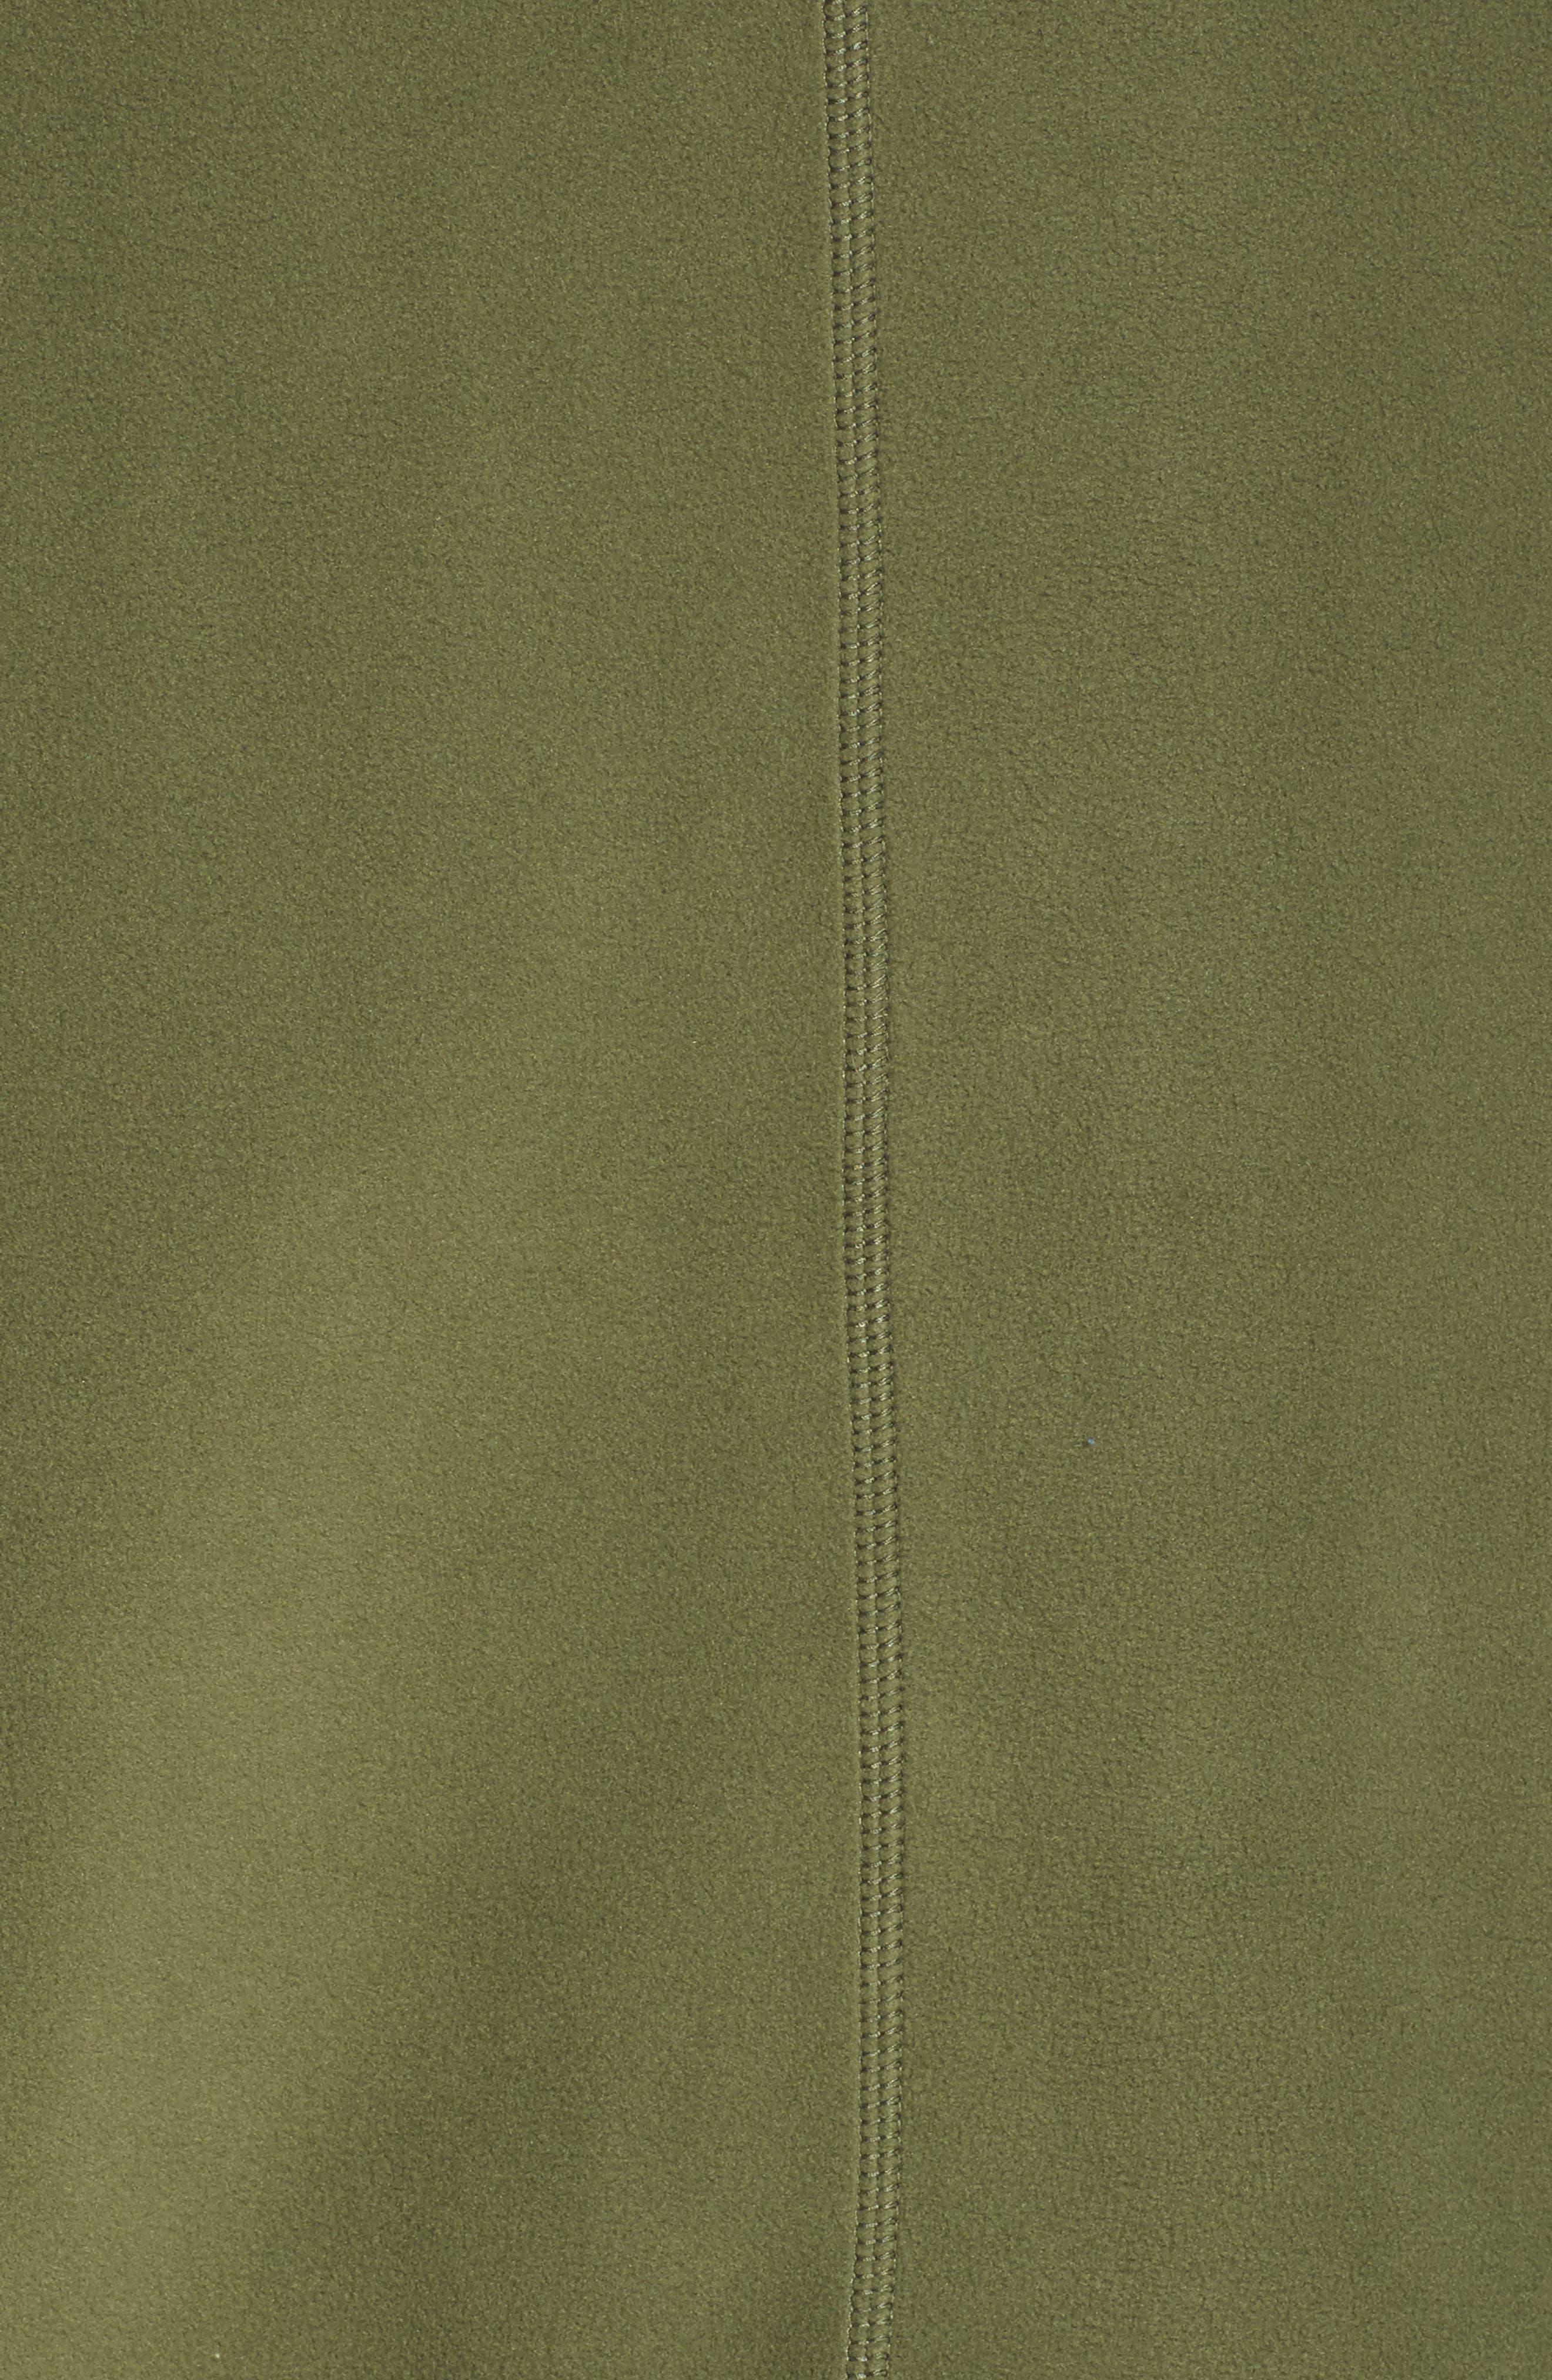 FP Movement Higher Ground Fleece Jacket,                             Alternate thumbnail 11, color,